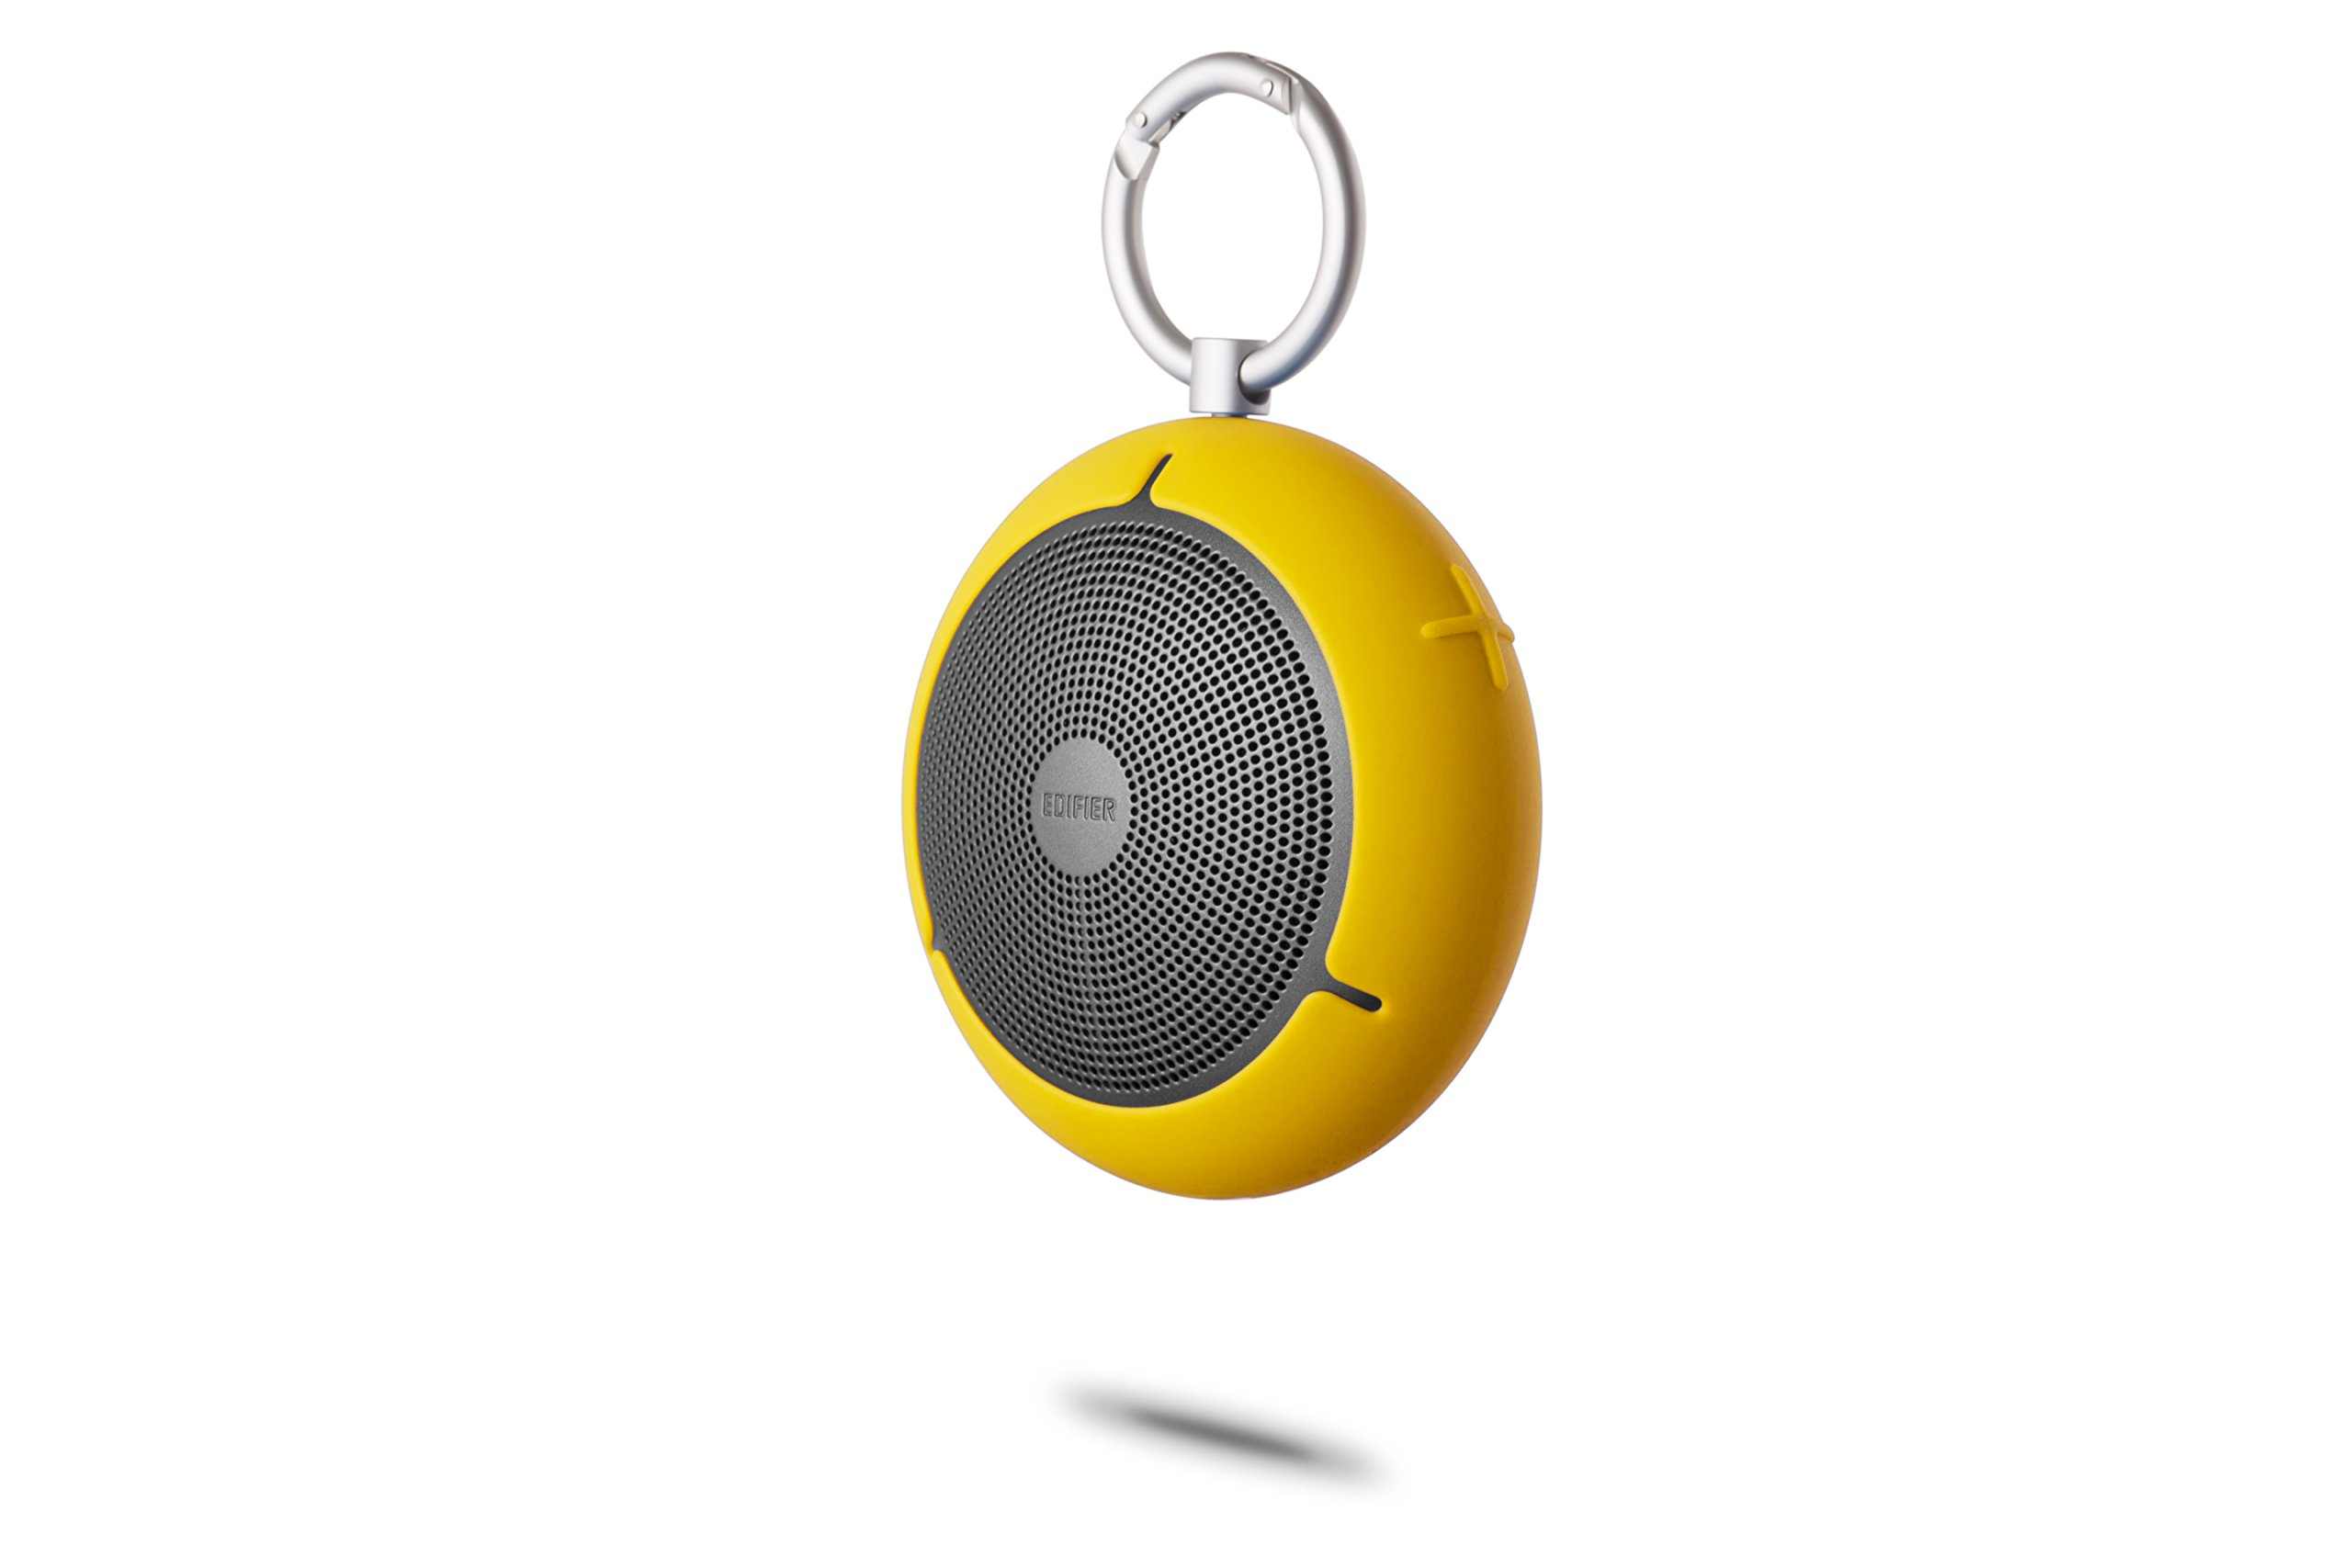 Parlante Bluetooth Edifier MP100 Portable Wireless Splash/Du